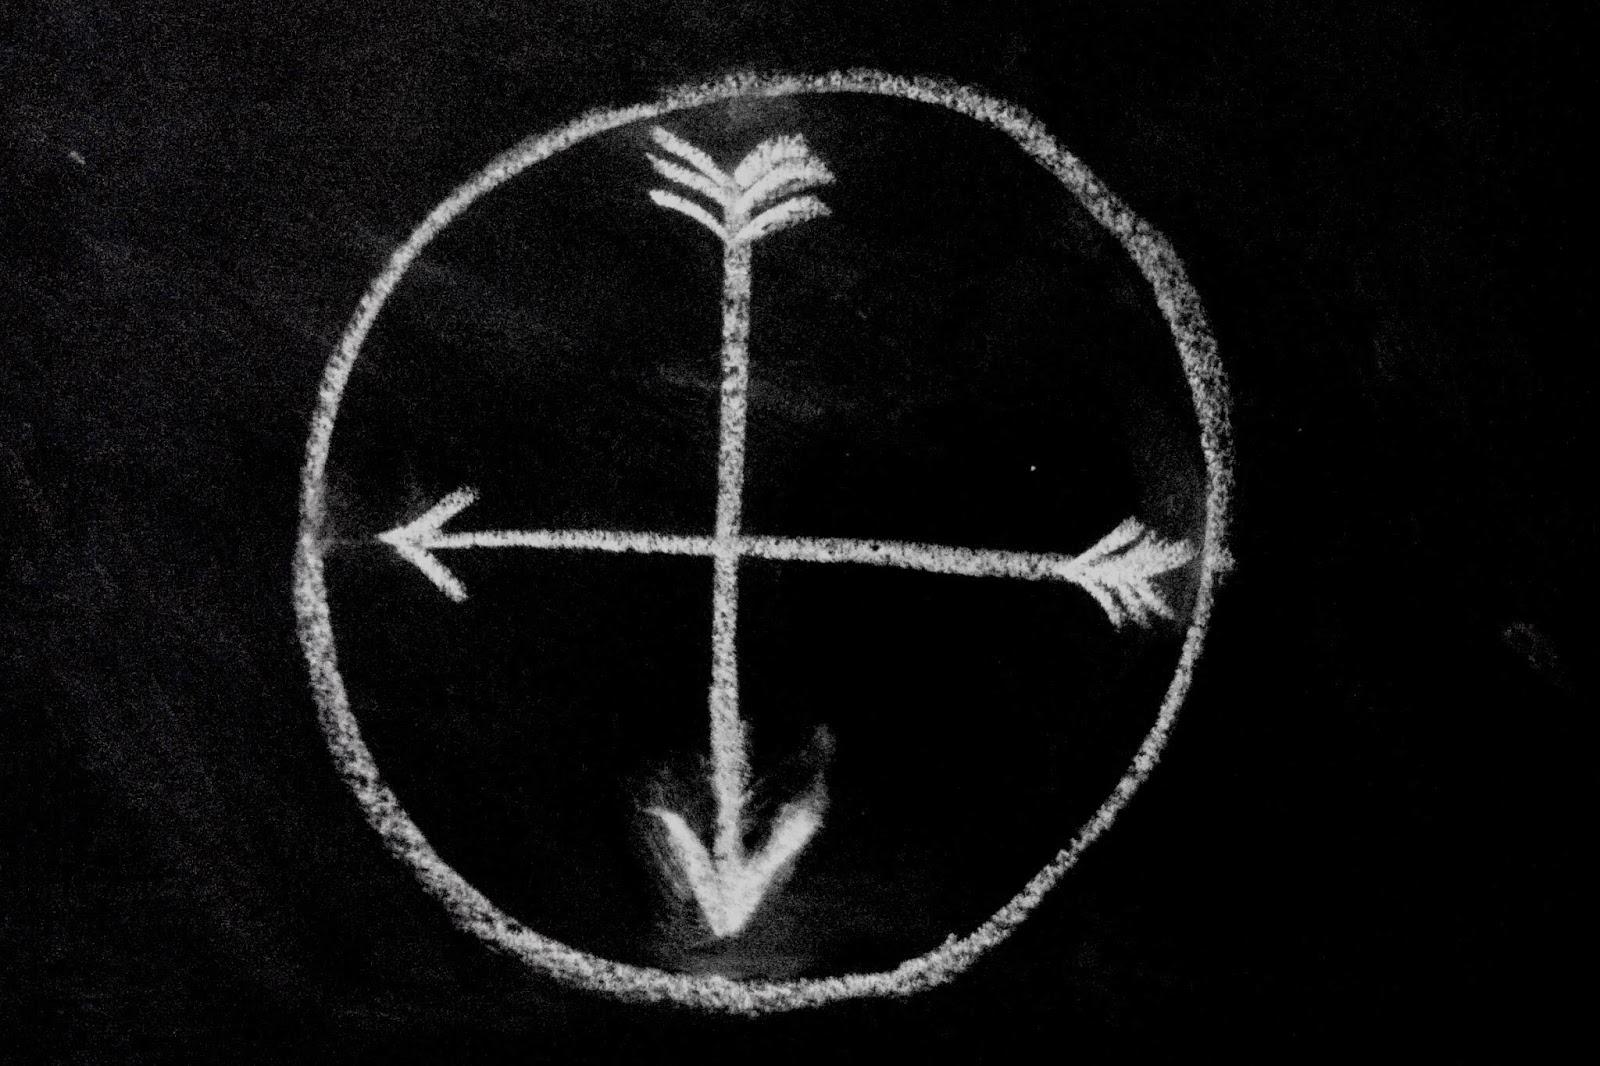 PALO MONTENEGRO KIMBISA QUIEN VENCE!: DIMAMANGA: La